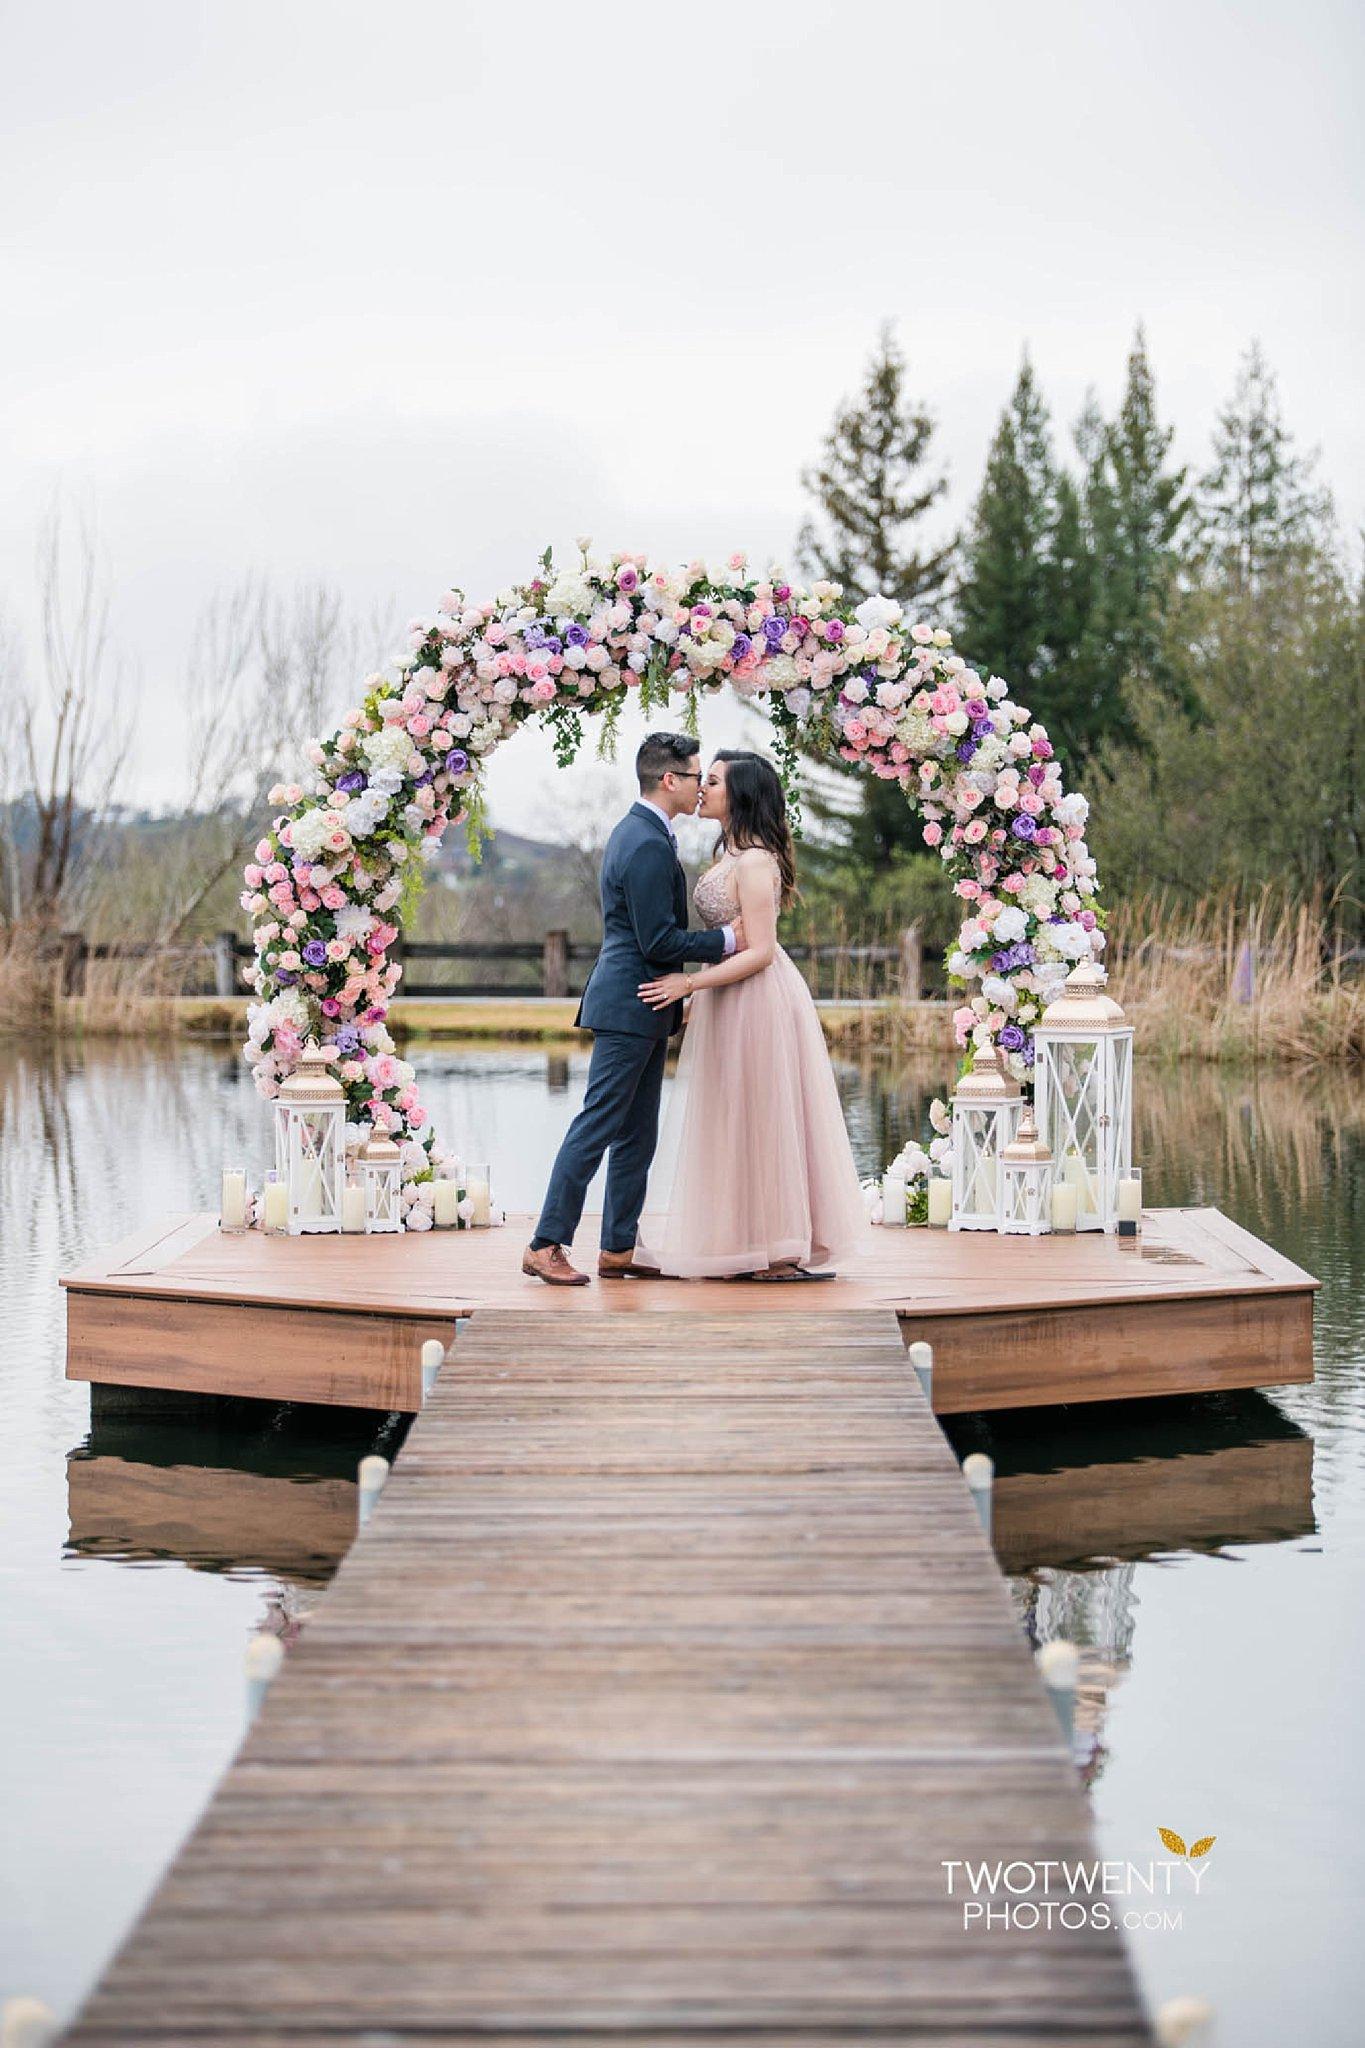 Bywater Hollow Lavender Farm Sacramento engagement Roseville Folsom wedding photographer